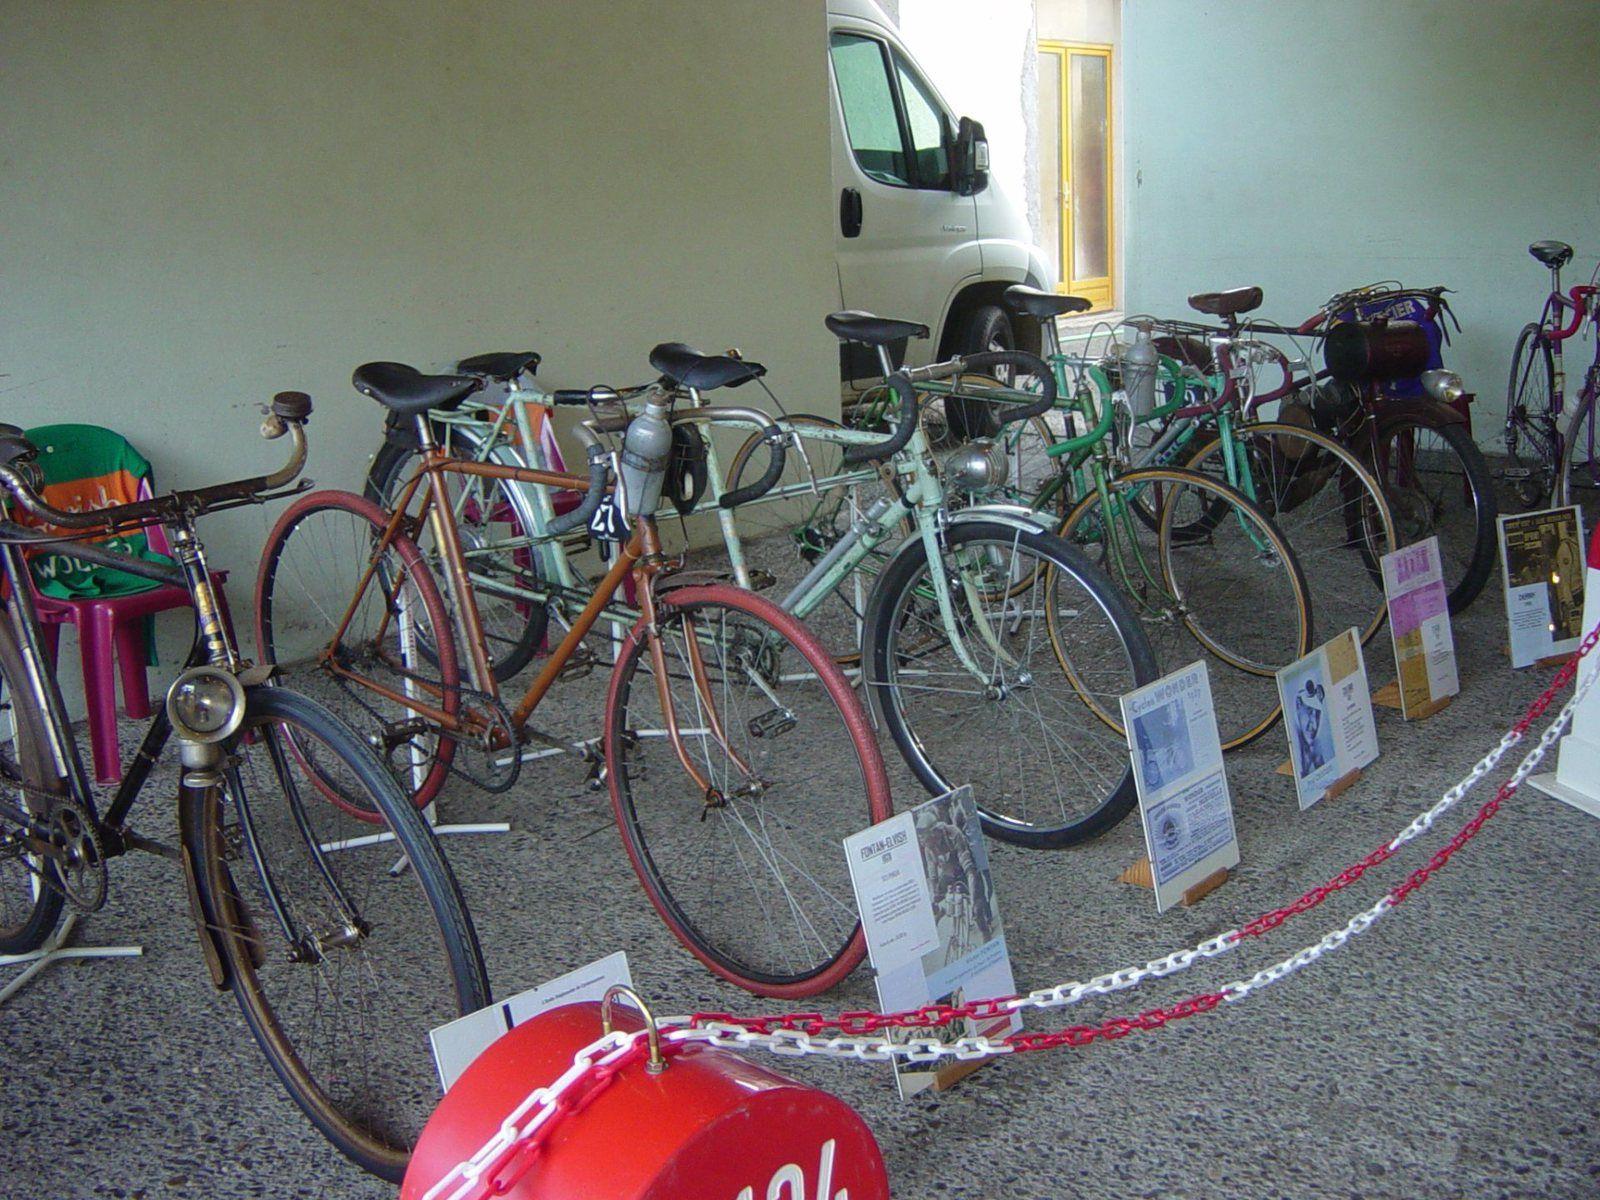 Vélo de tourisme, courses....